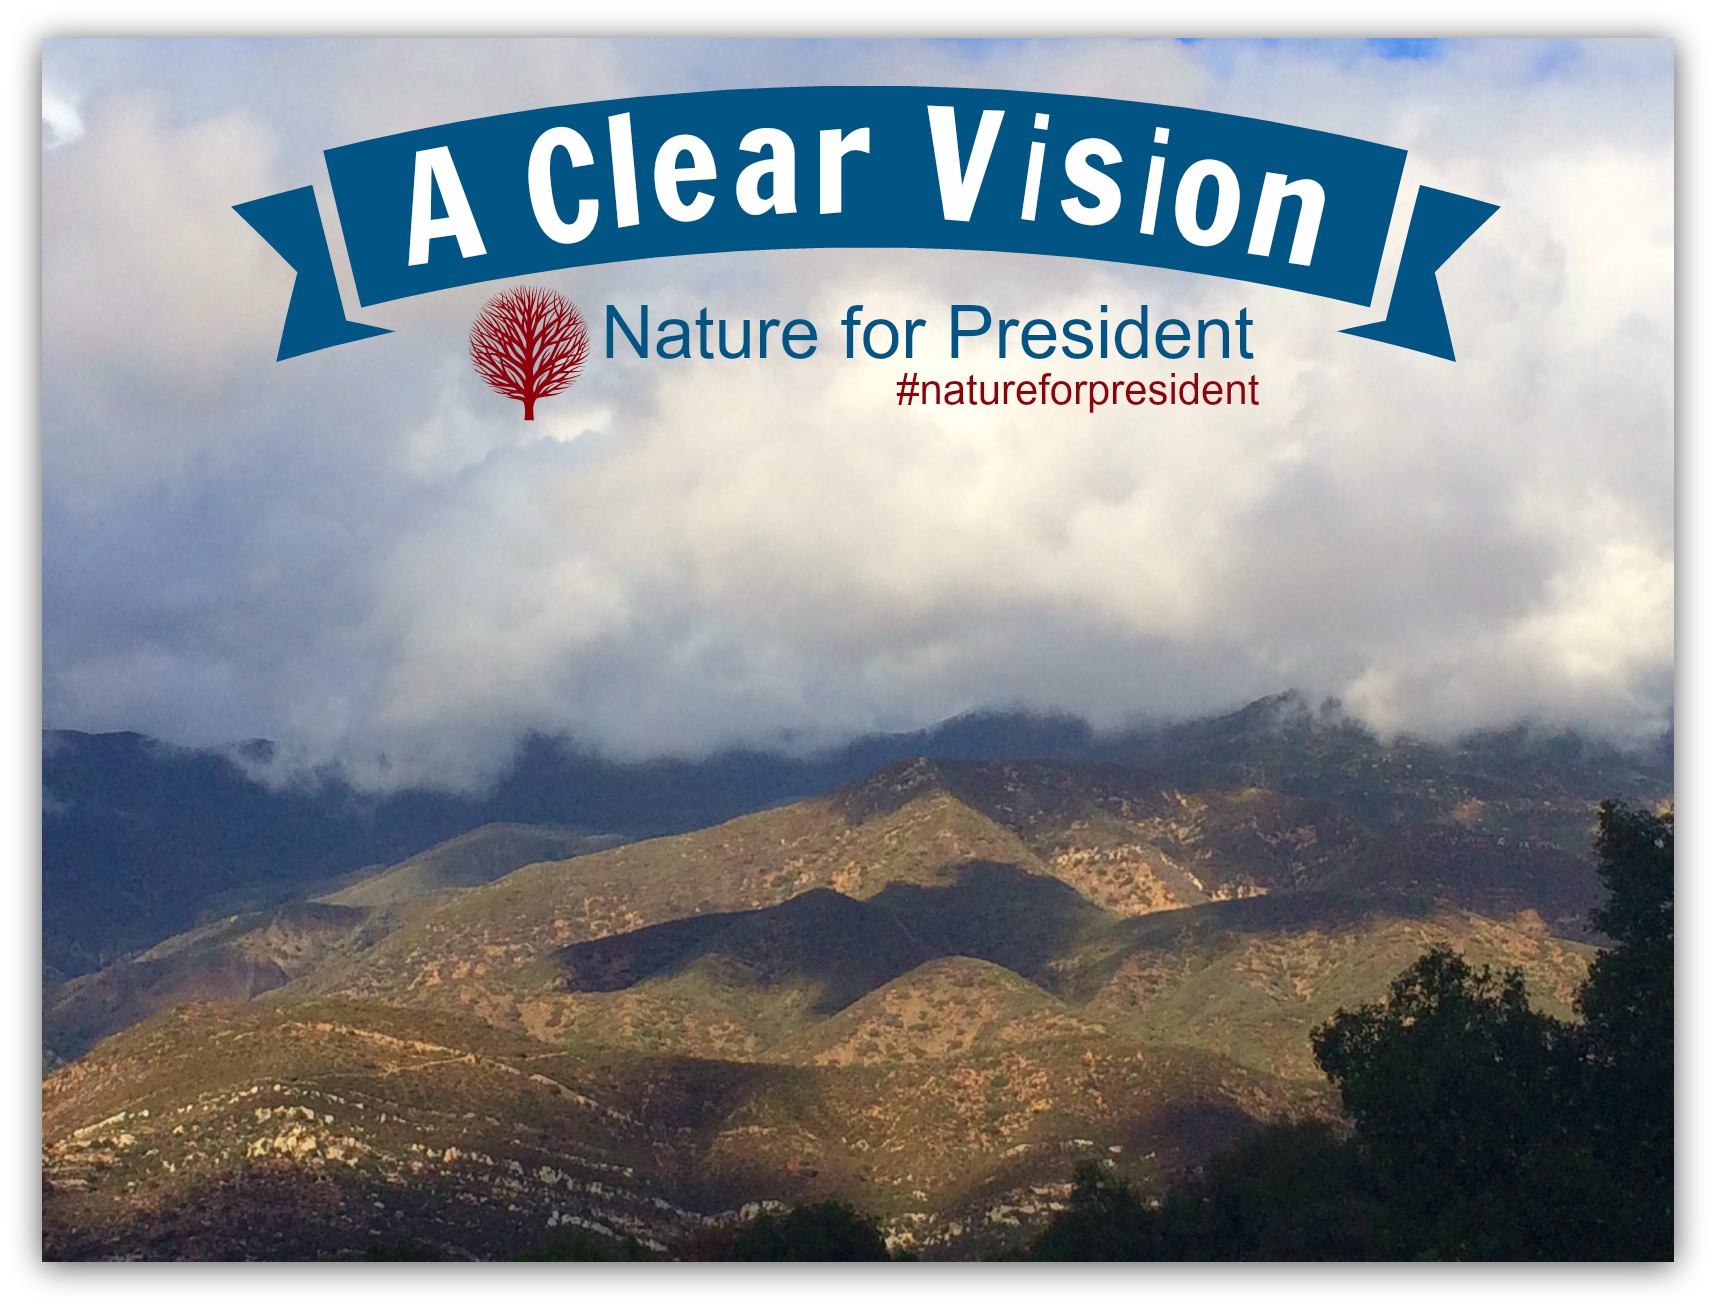 4 A clear vision